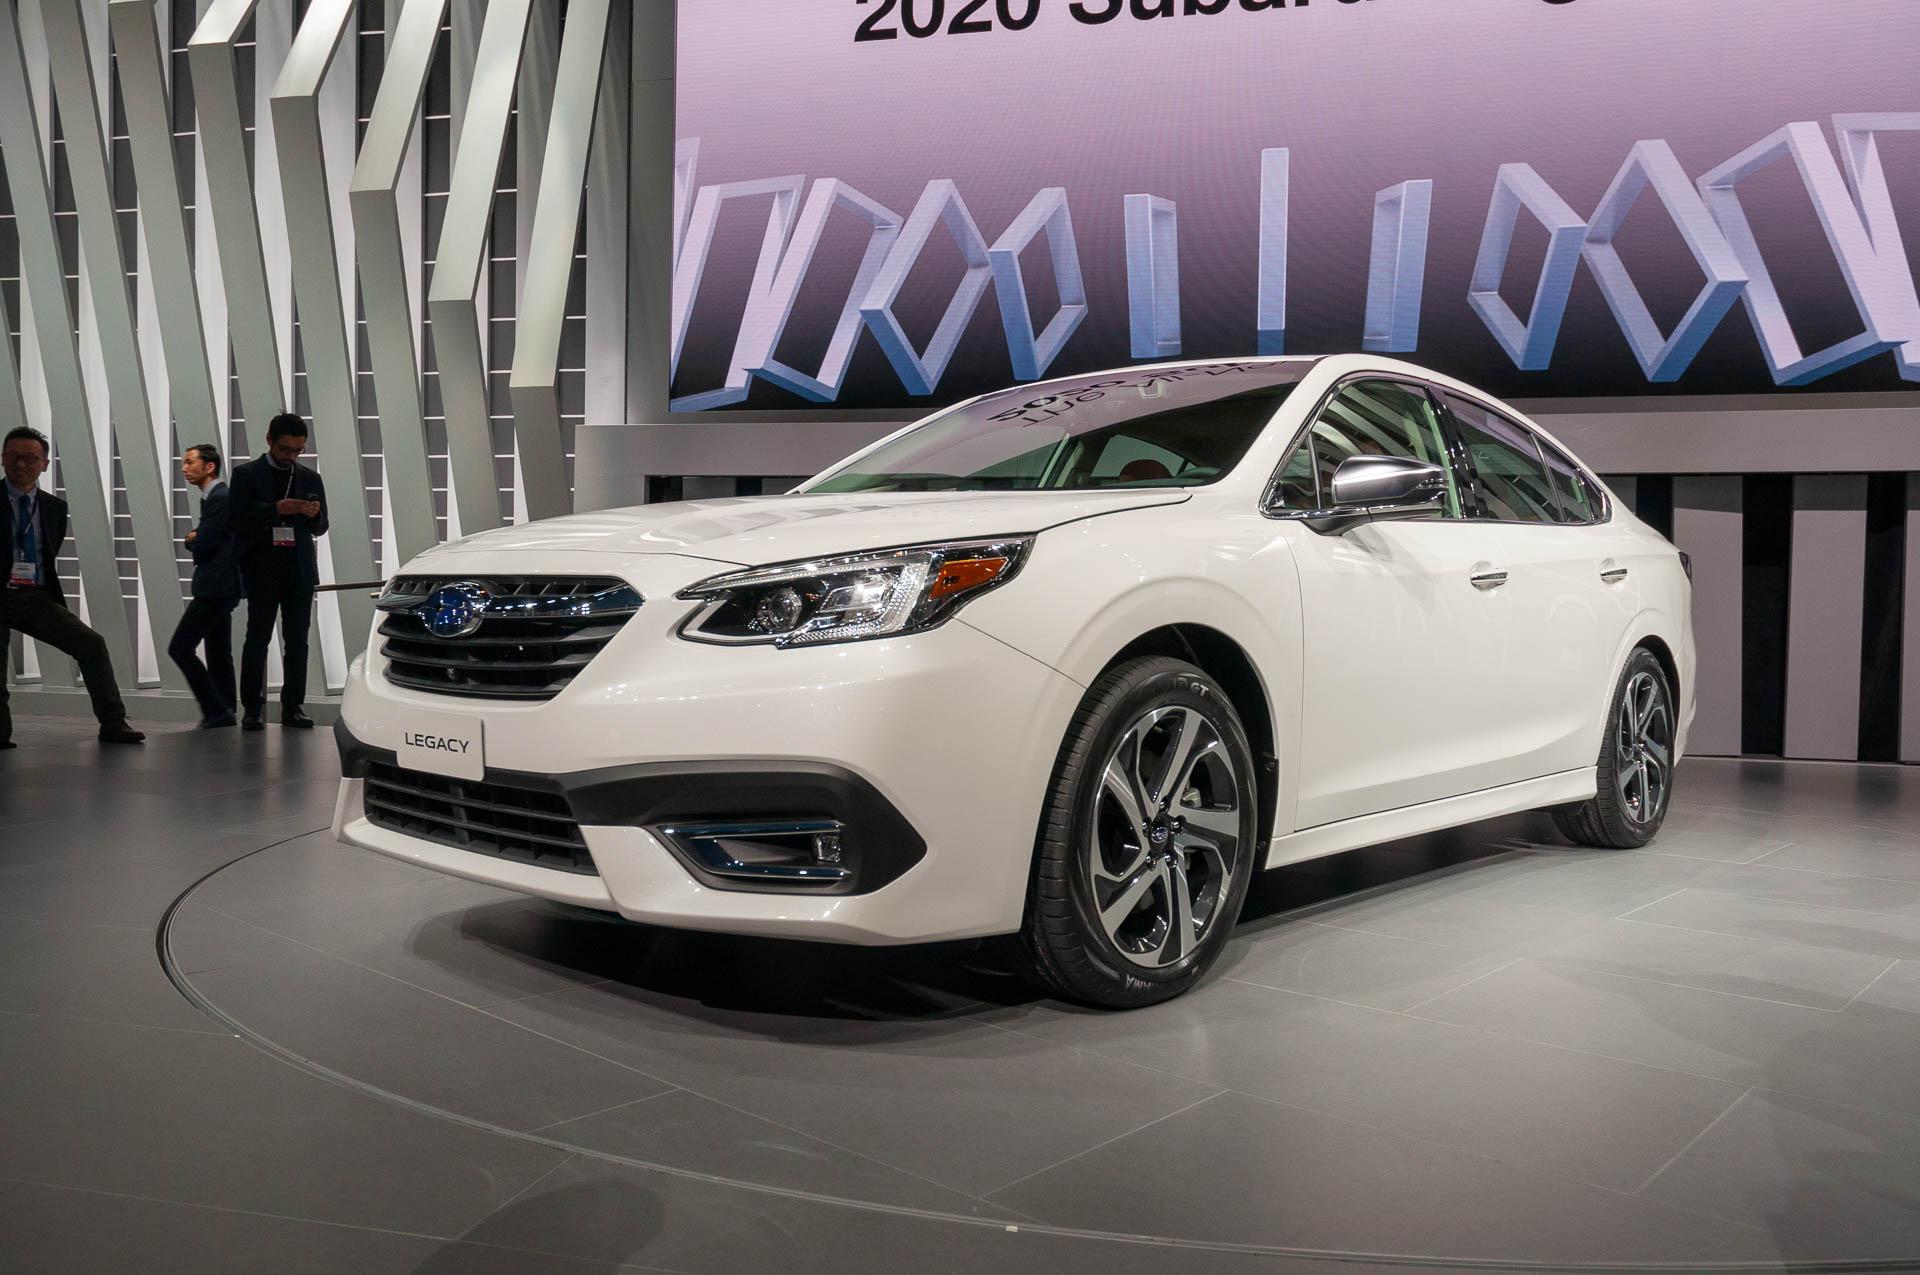 2020 Subaru Legacy preview